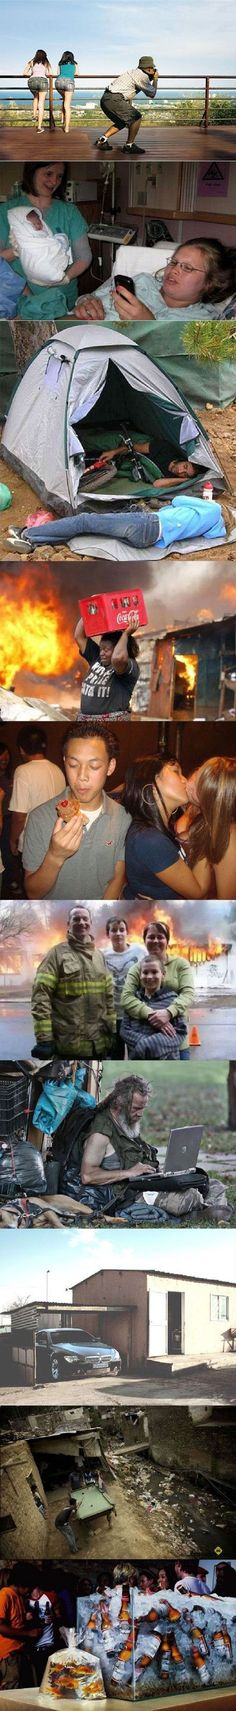 Funny odd photos http://ibeebz.com